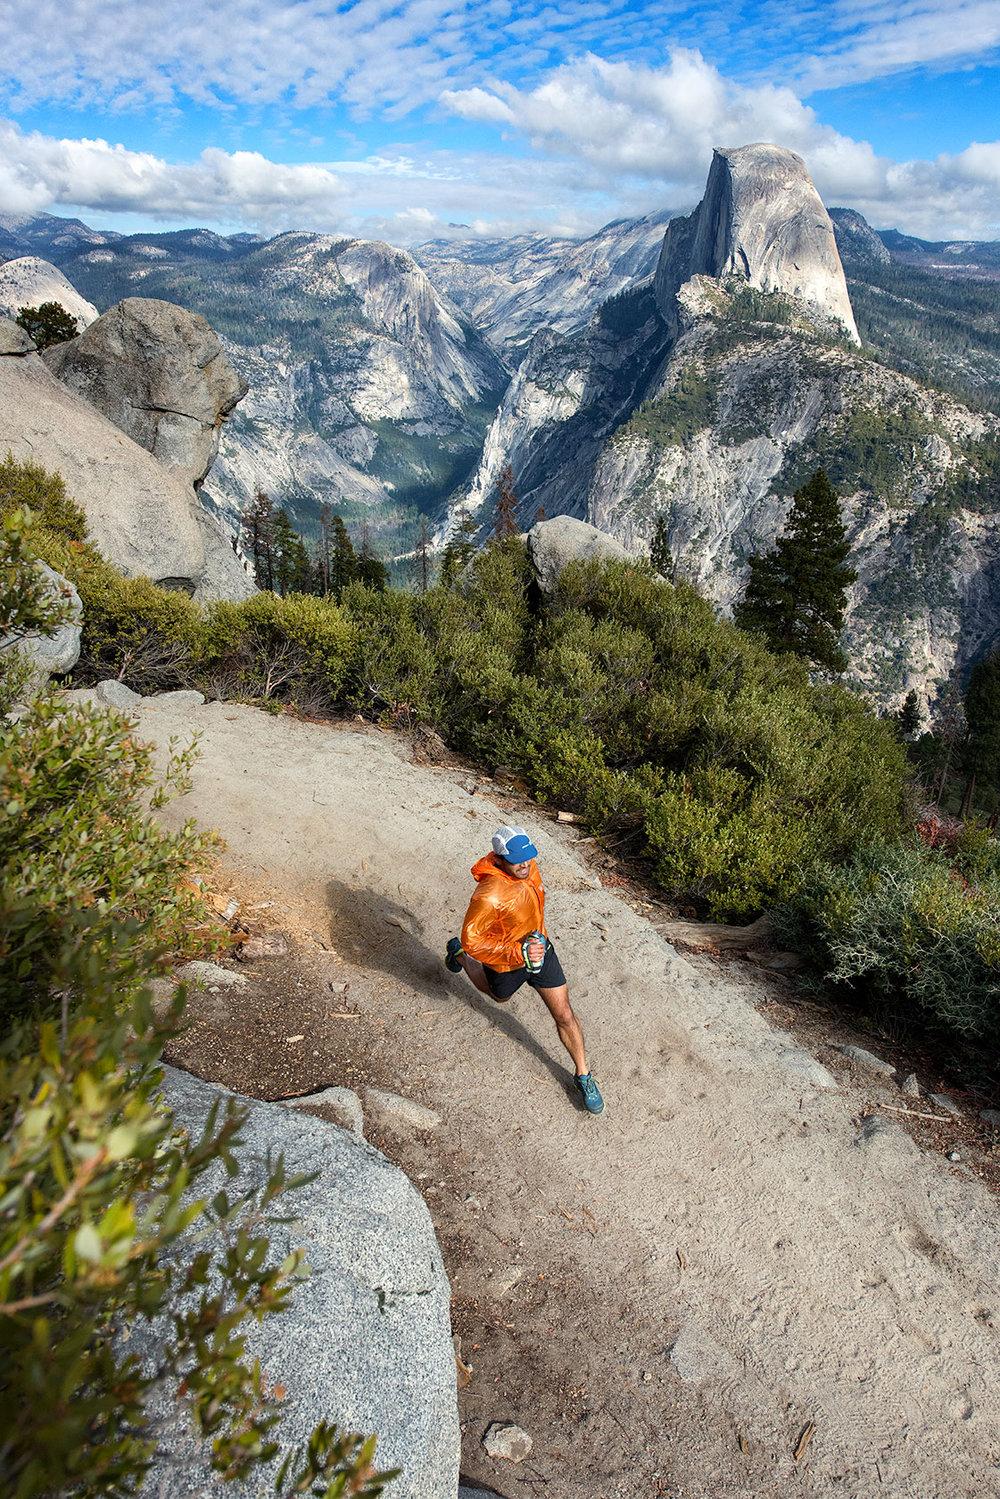 austin-trigg-yosemite-national-park-california-Run-Panoramic-trail-running-half-dome-valley-adventure-excersie.jpg